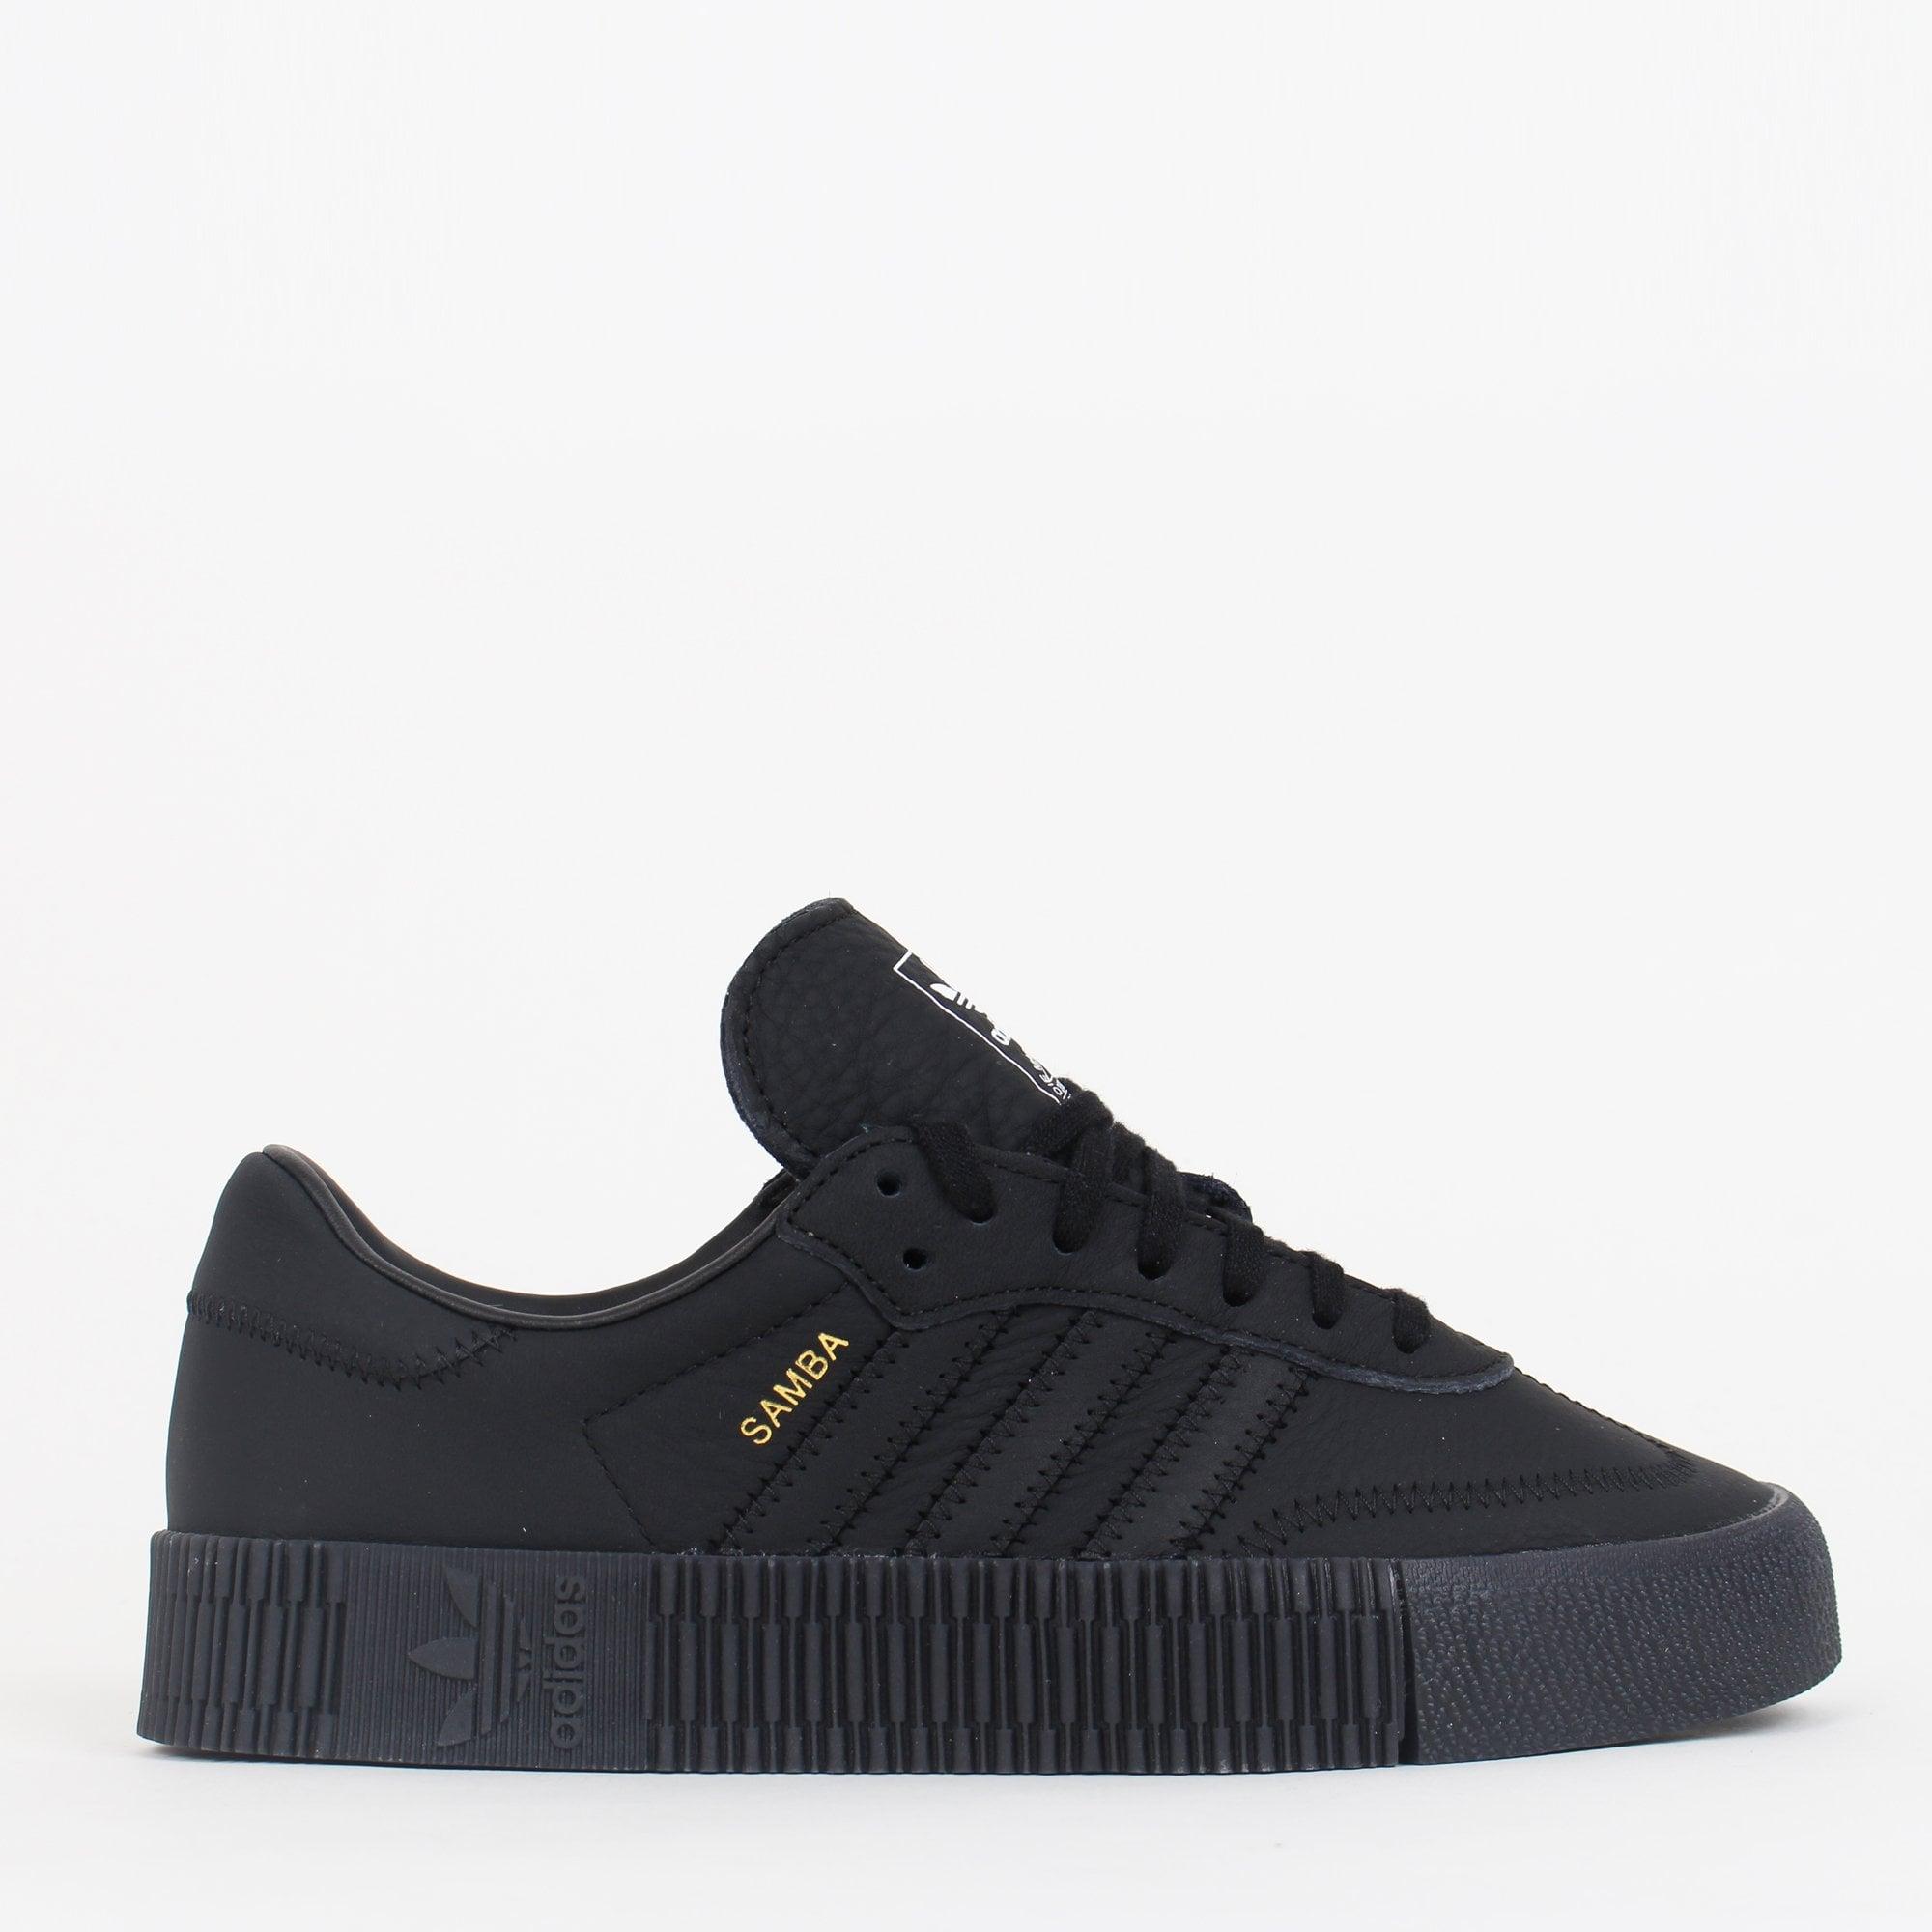 Adidas Originals Sambarose Women's